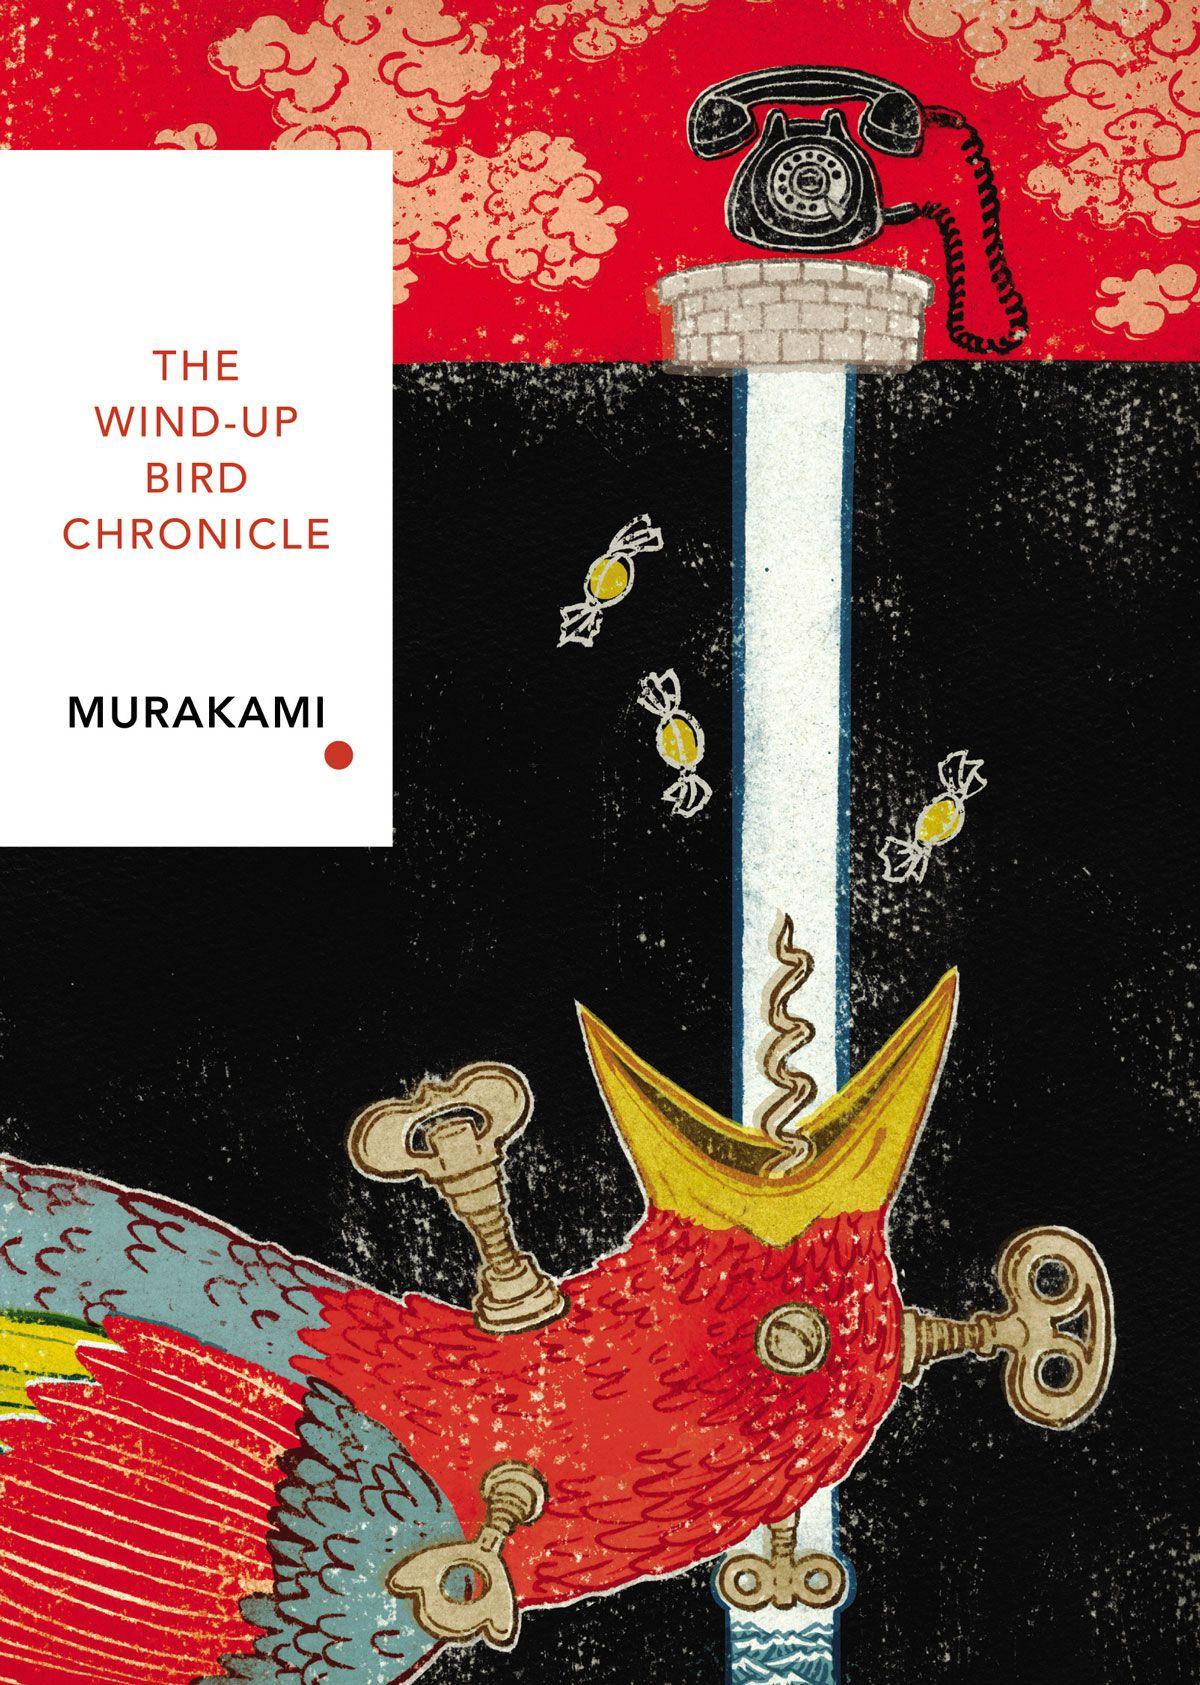 Vintage S New Book Series Spans A Century Of Japanese Fiction In 2020 Murakami Haruki Murakami Japanese Artwork